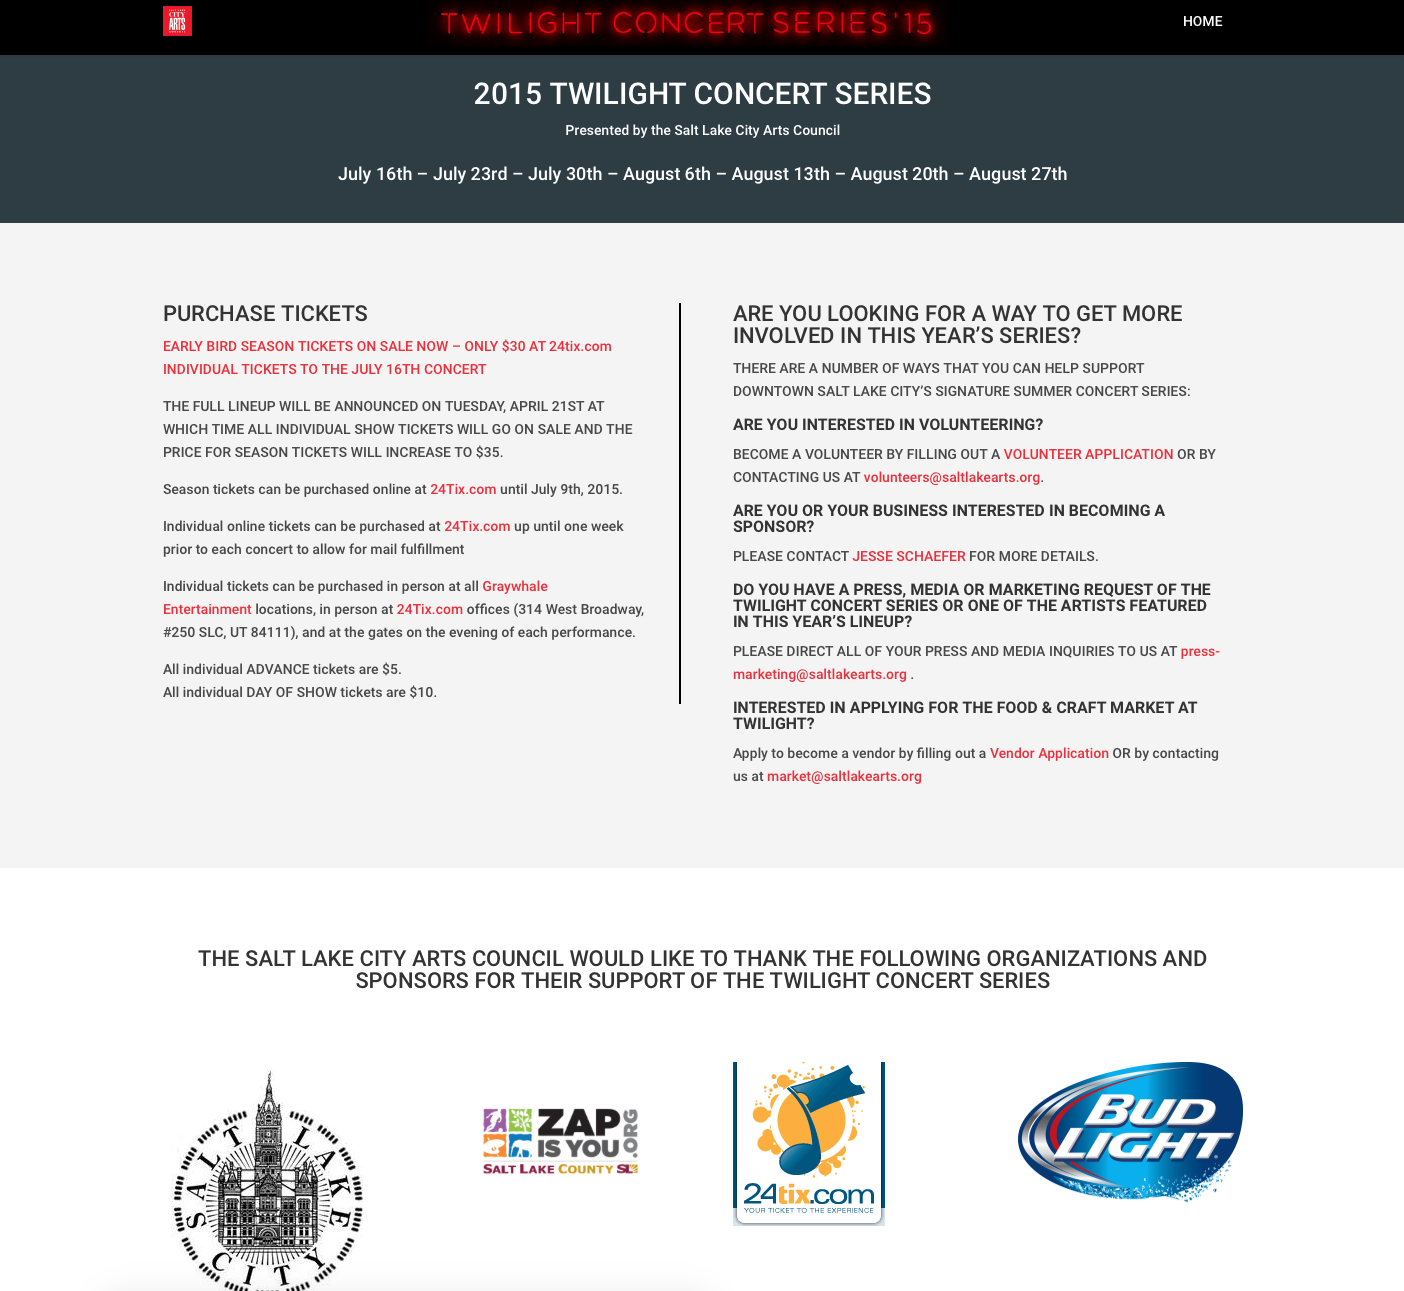 Twilight Concert Series 2015 below the fold